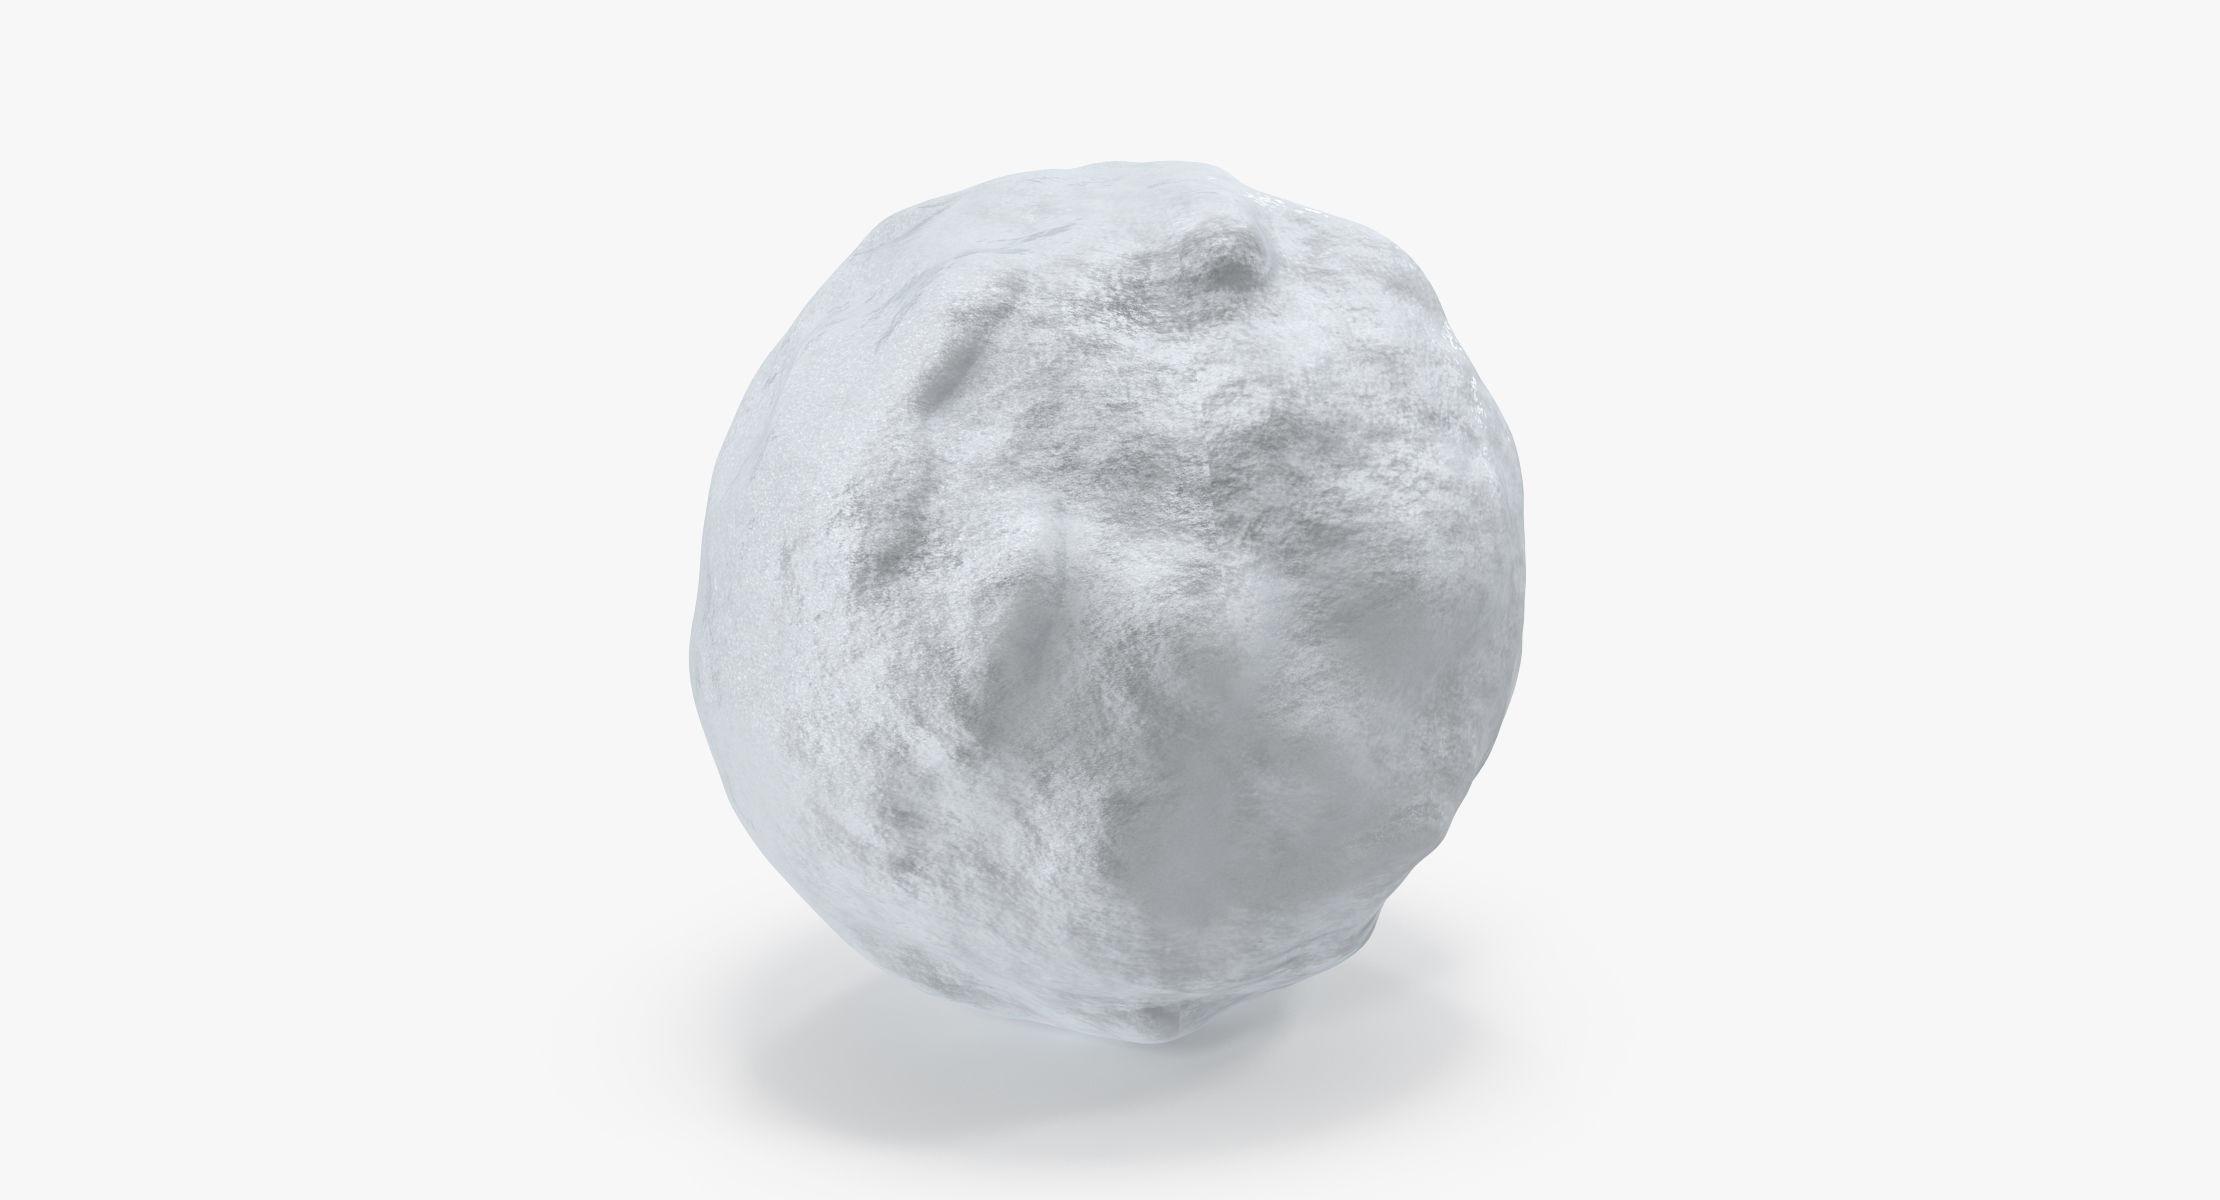 Snowball 03 - reel 1